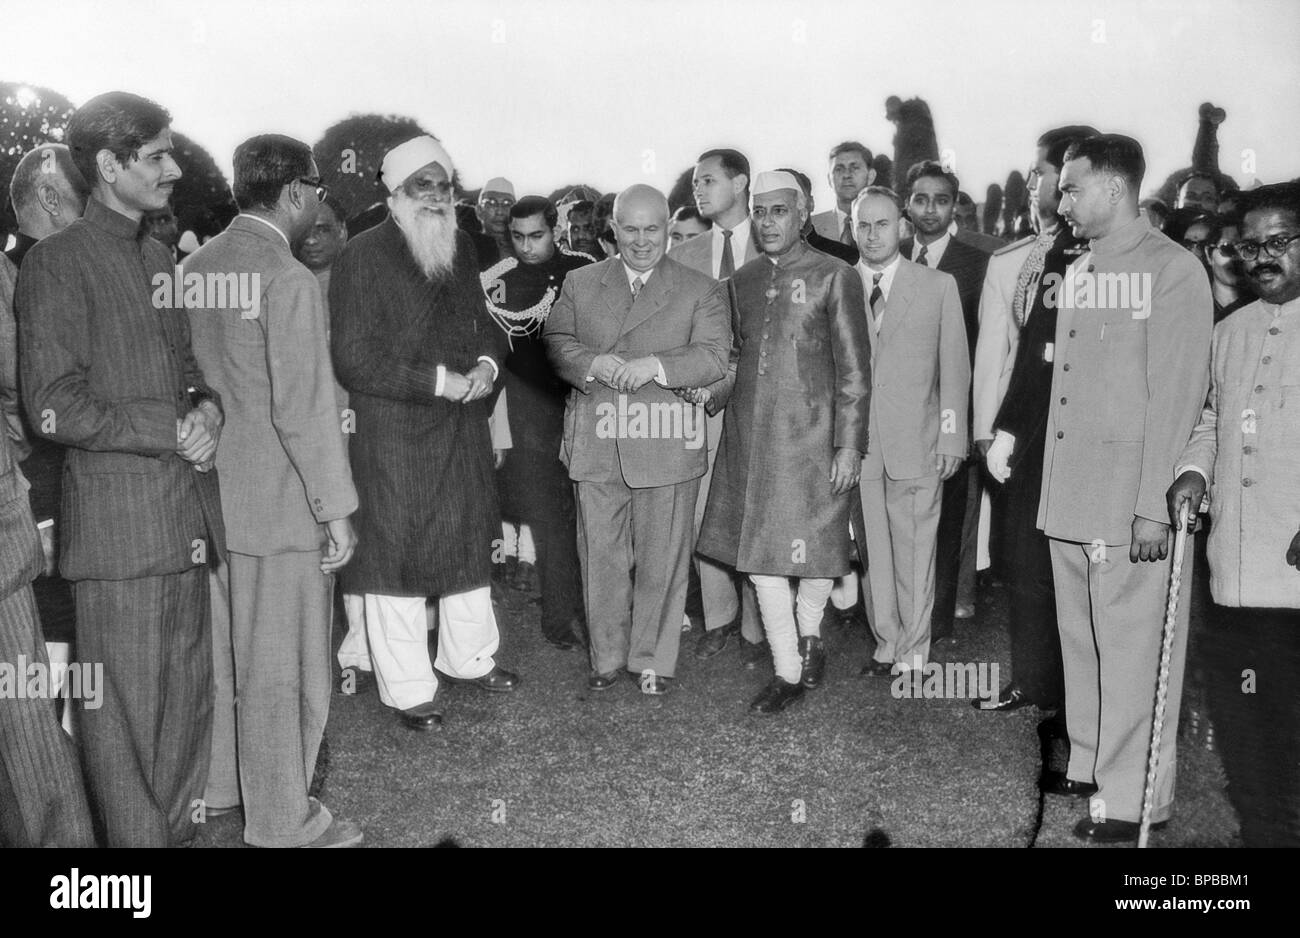 Nikita Khrushchev and Jawaharlal Nehru, 1955 - Stock Image